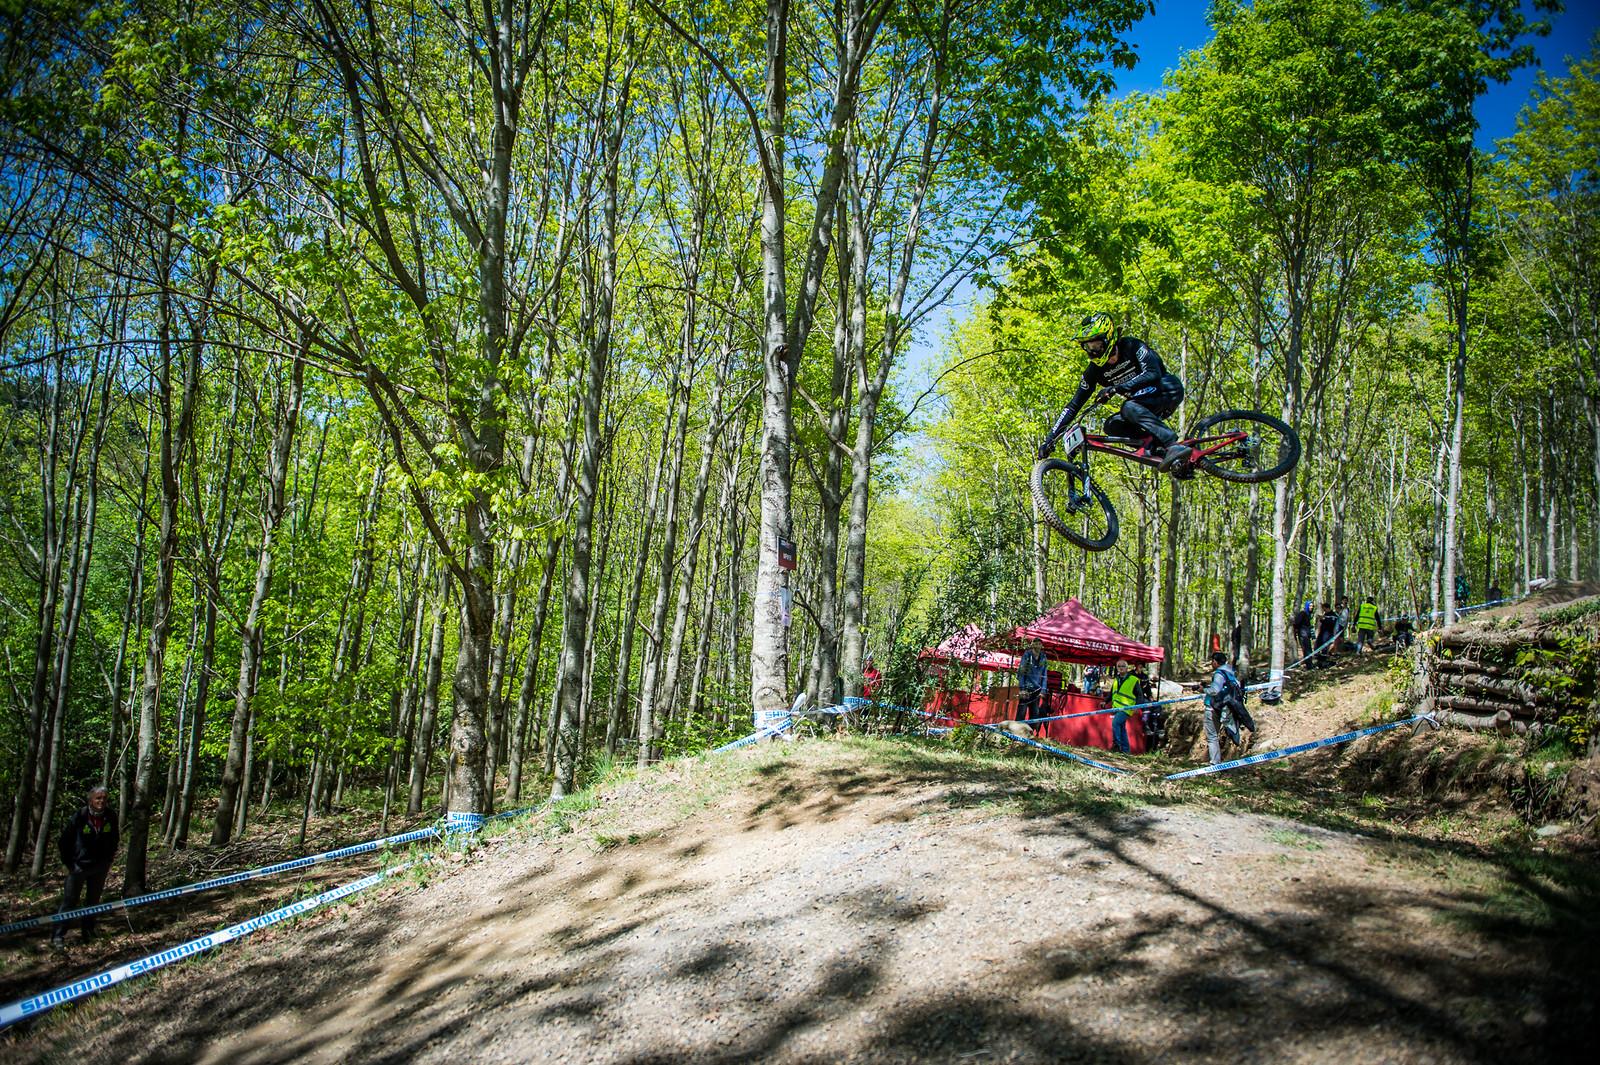 Jerome Caroli - iceman2058 - Mountain Biking Pictures - Vital MTB